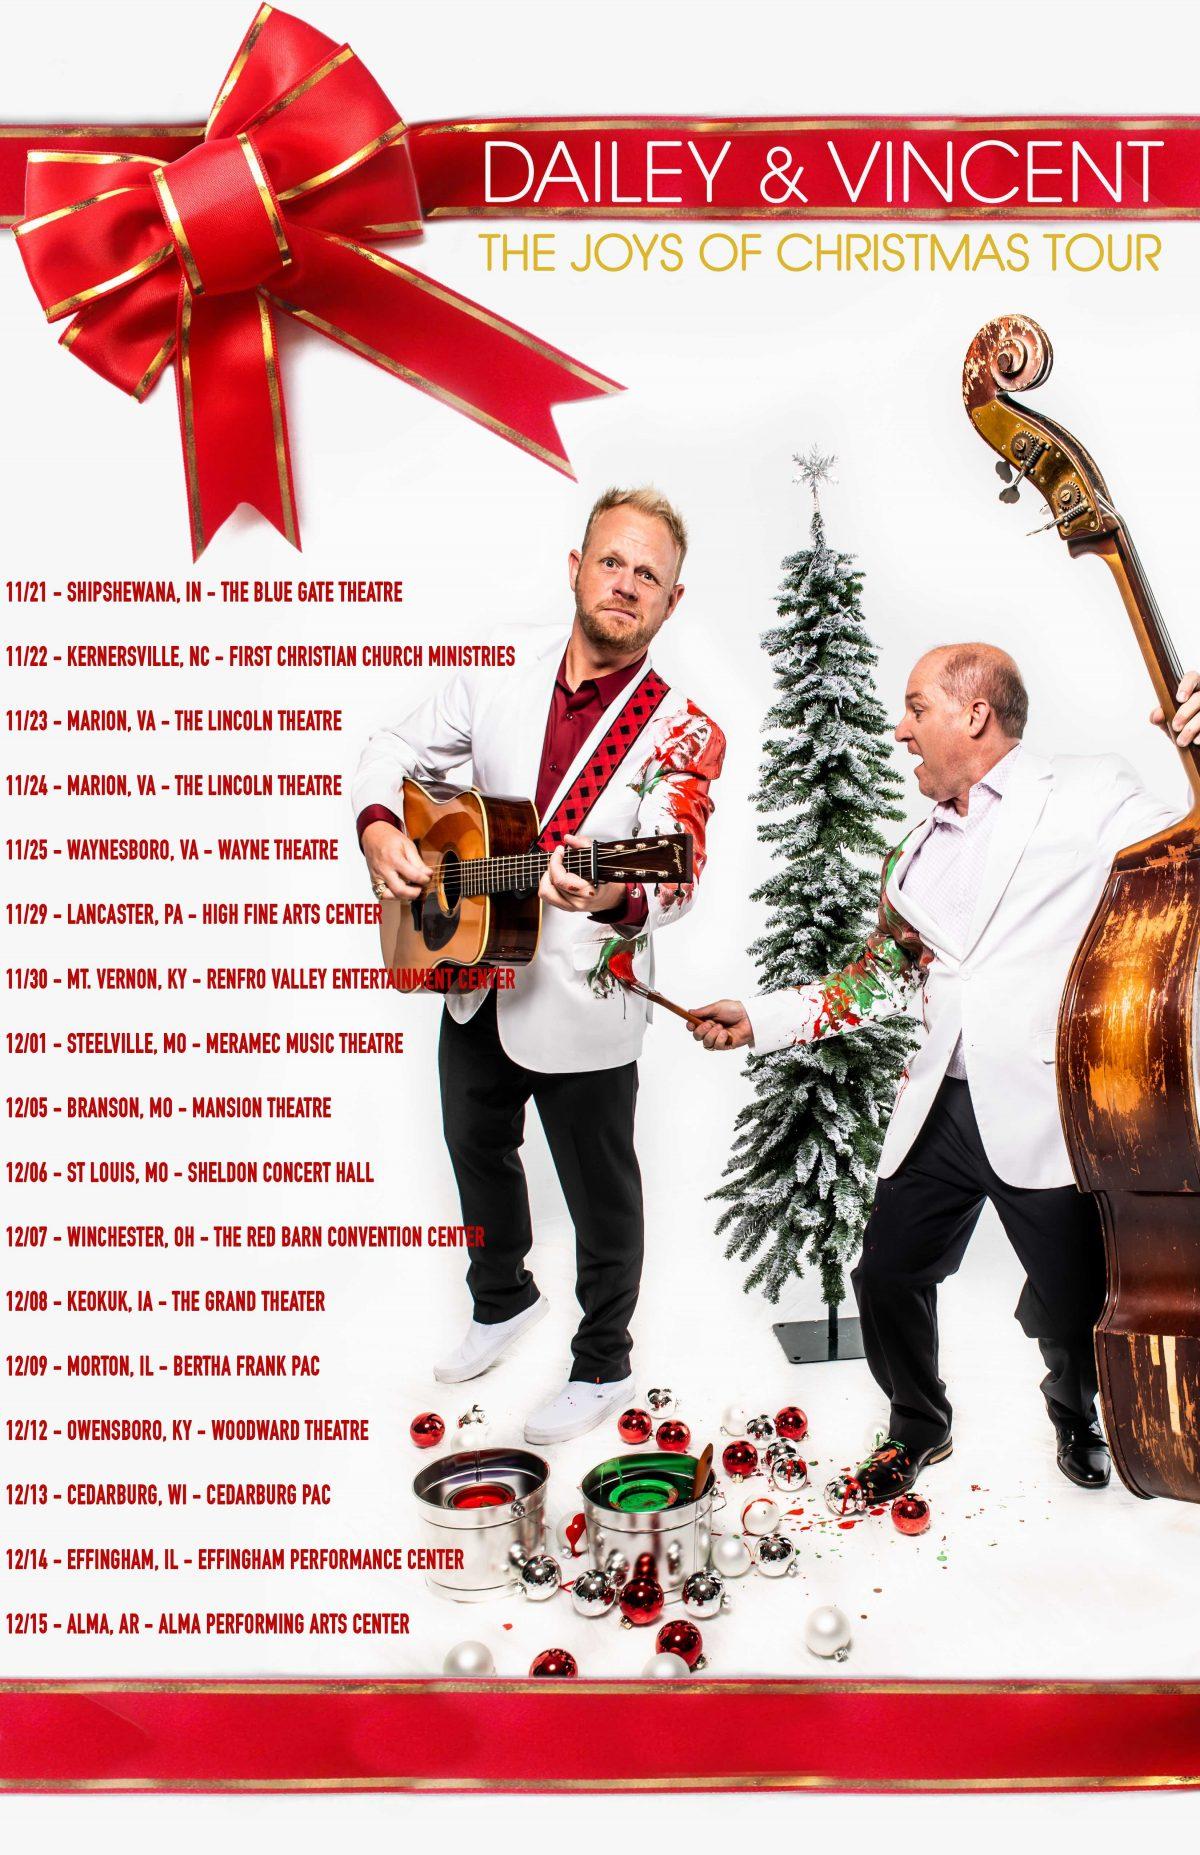 The Joys Of Christmas.Dailey Vincent Announce The Joys Of Christmas Tour